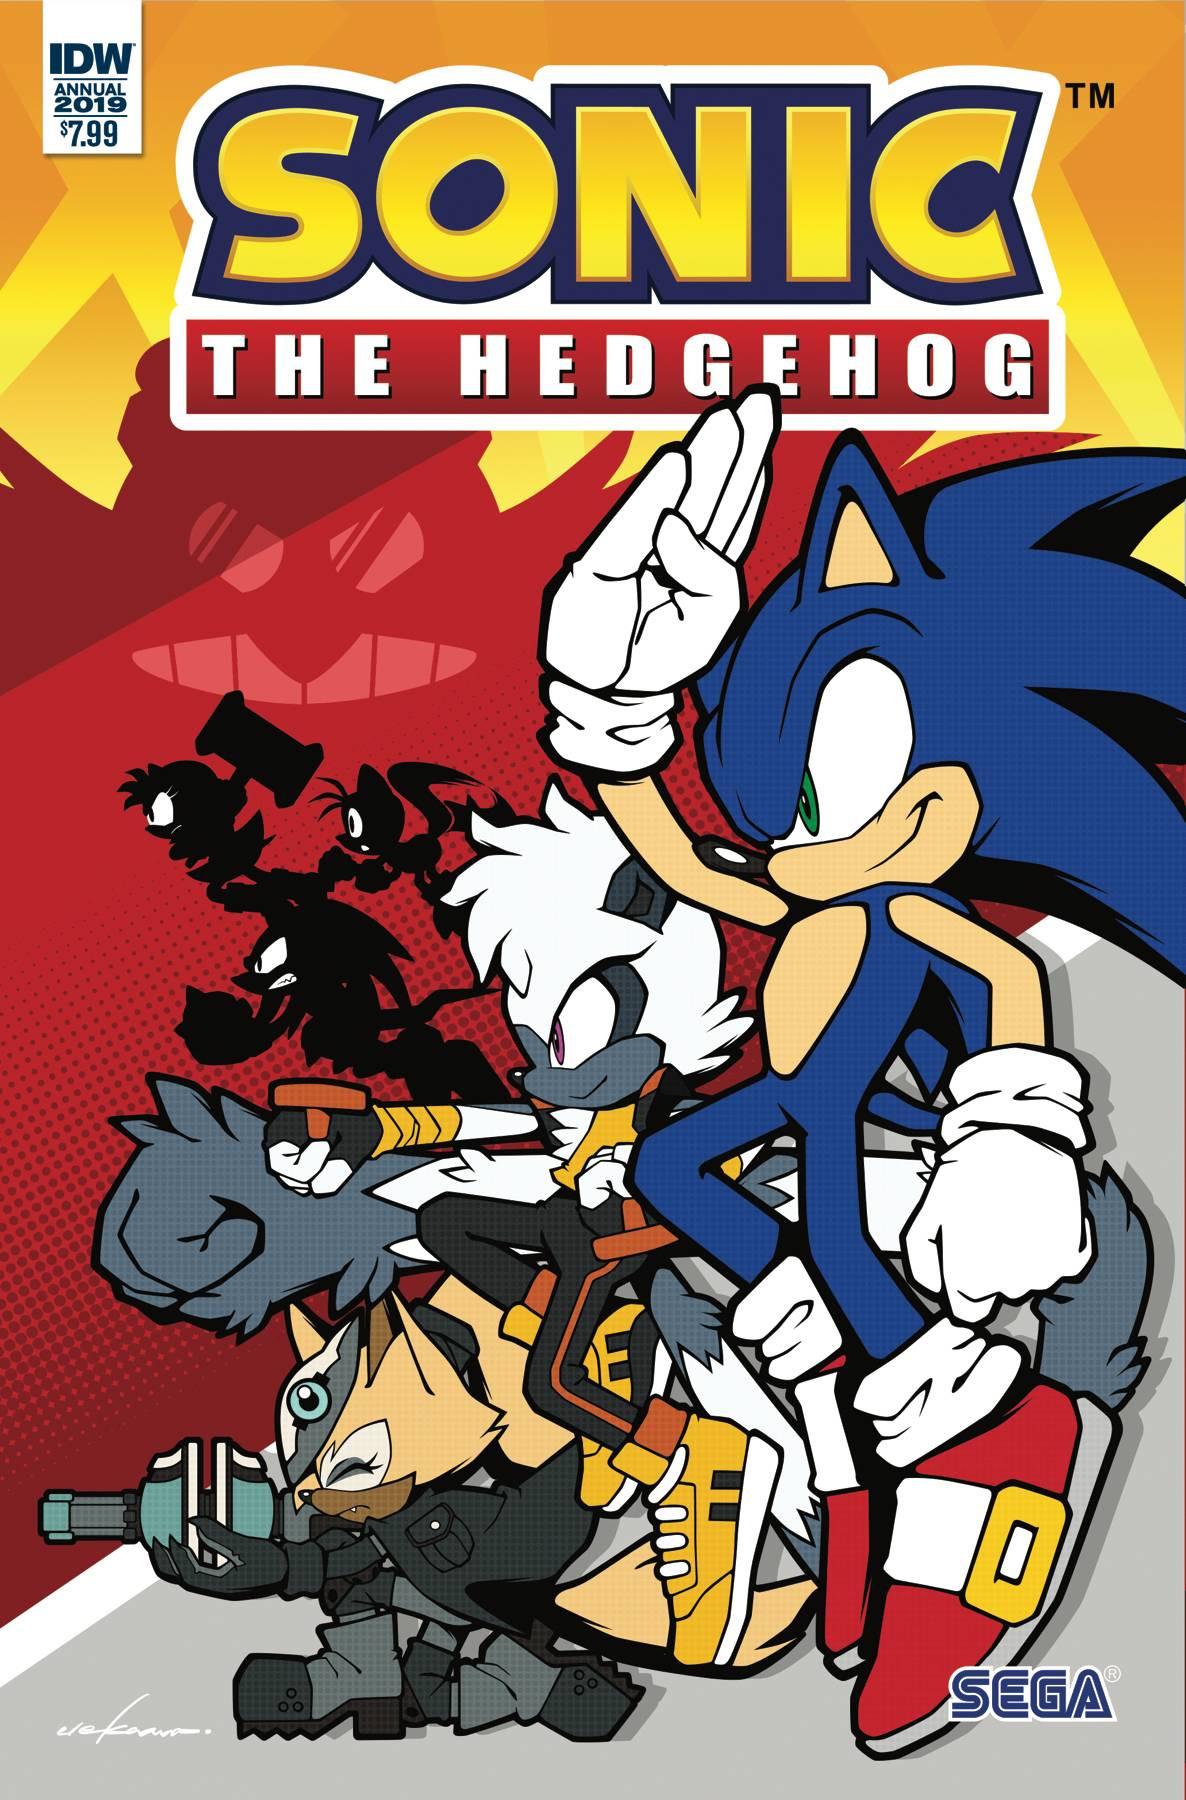 https://www.albumcomics.com/86667/sonic-the-hedgehog-annual-2019-vol-cvr-a-sonic-team.jpg